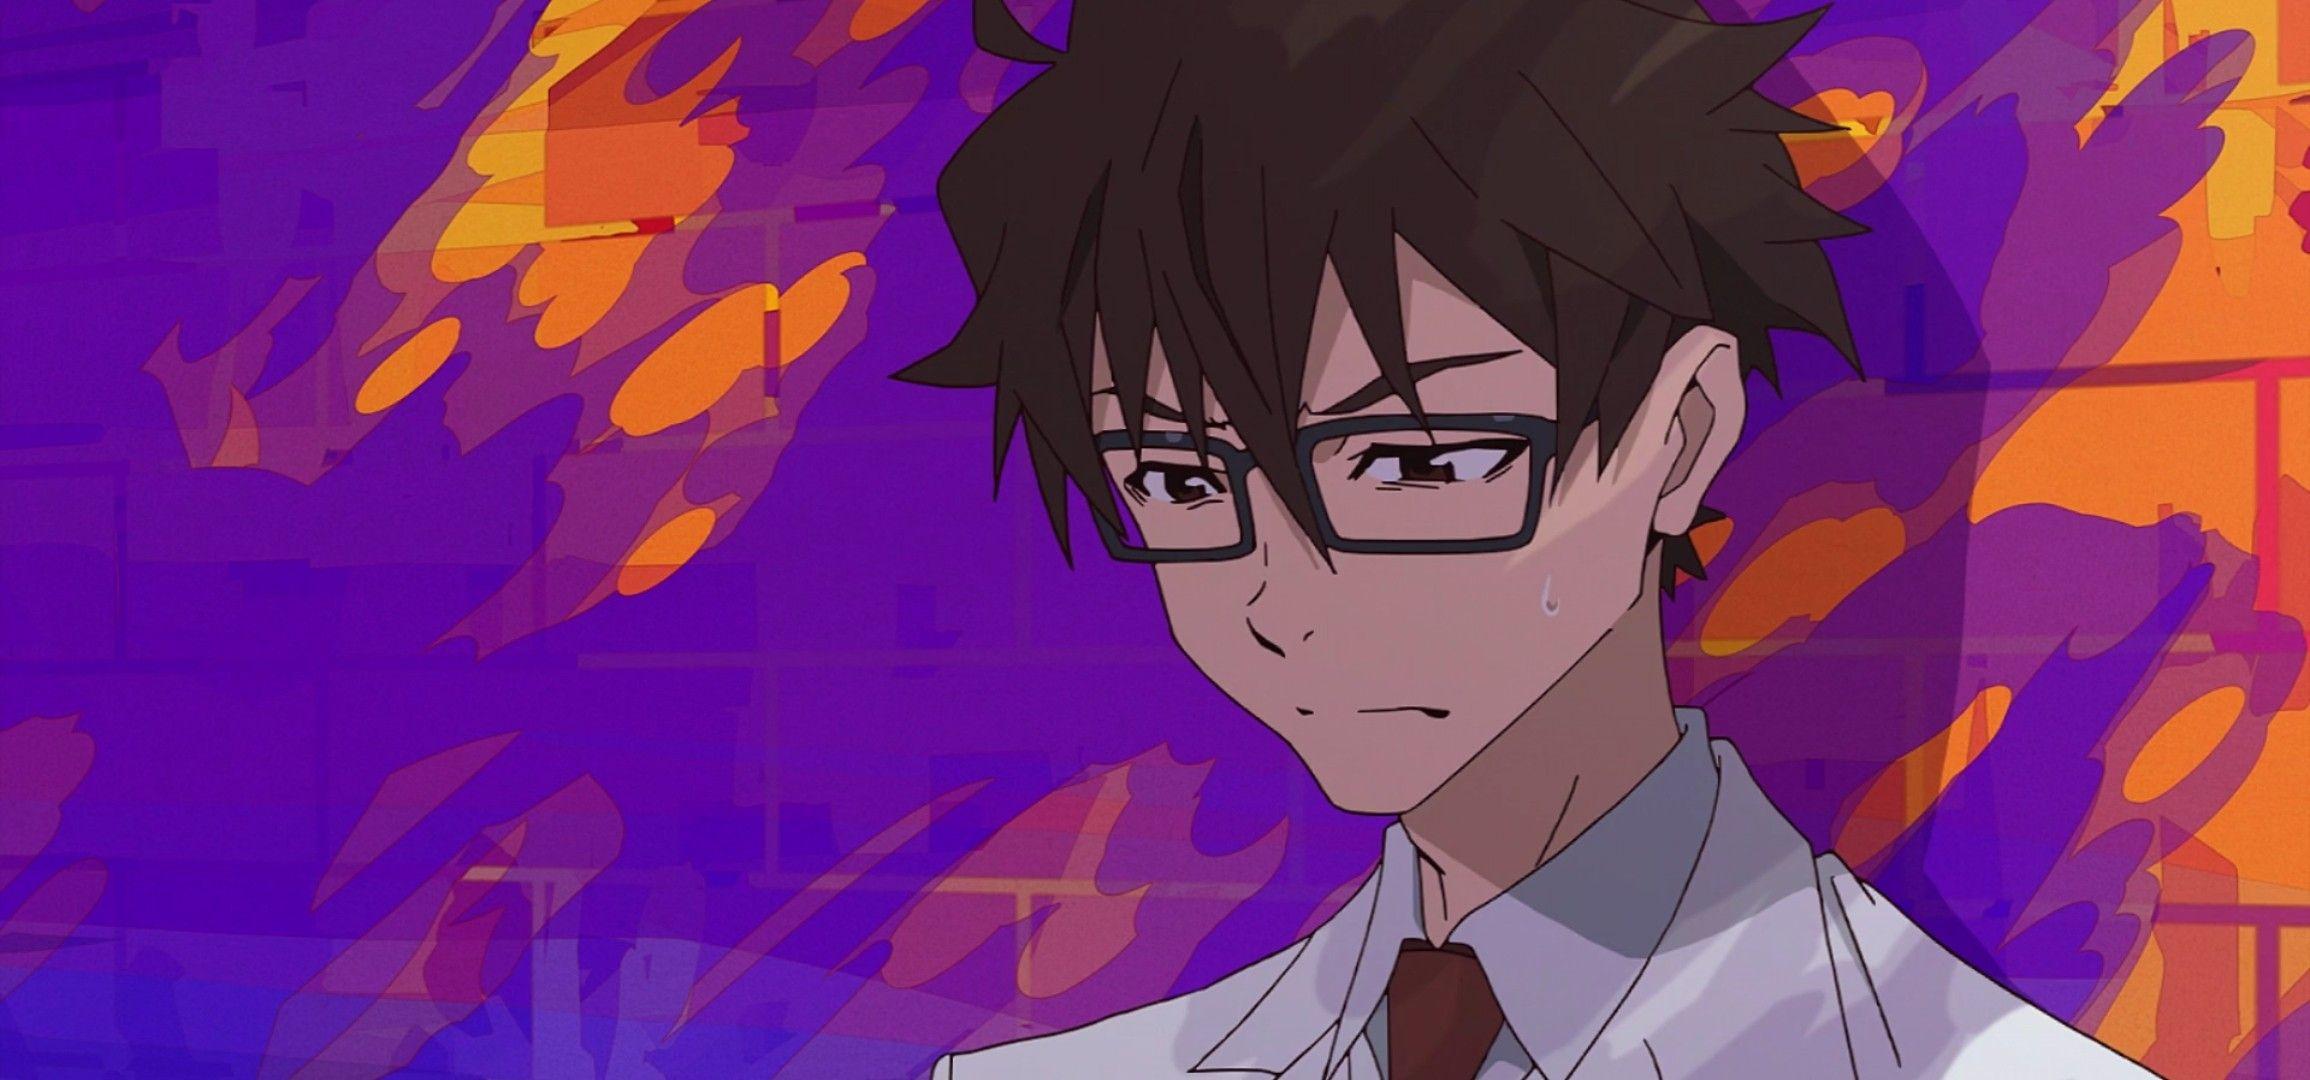 Pin By Hello On Anime Anime Anime Babies Edamura